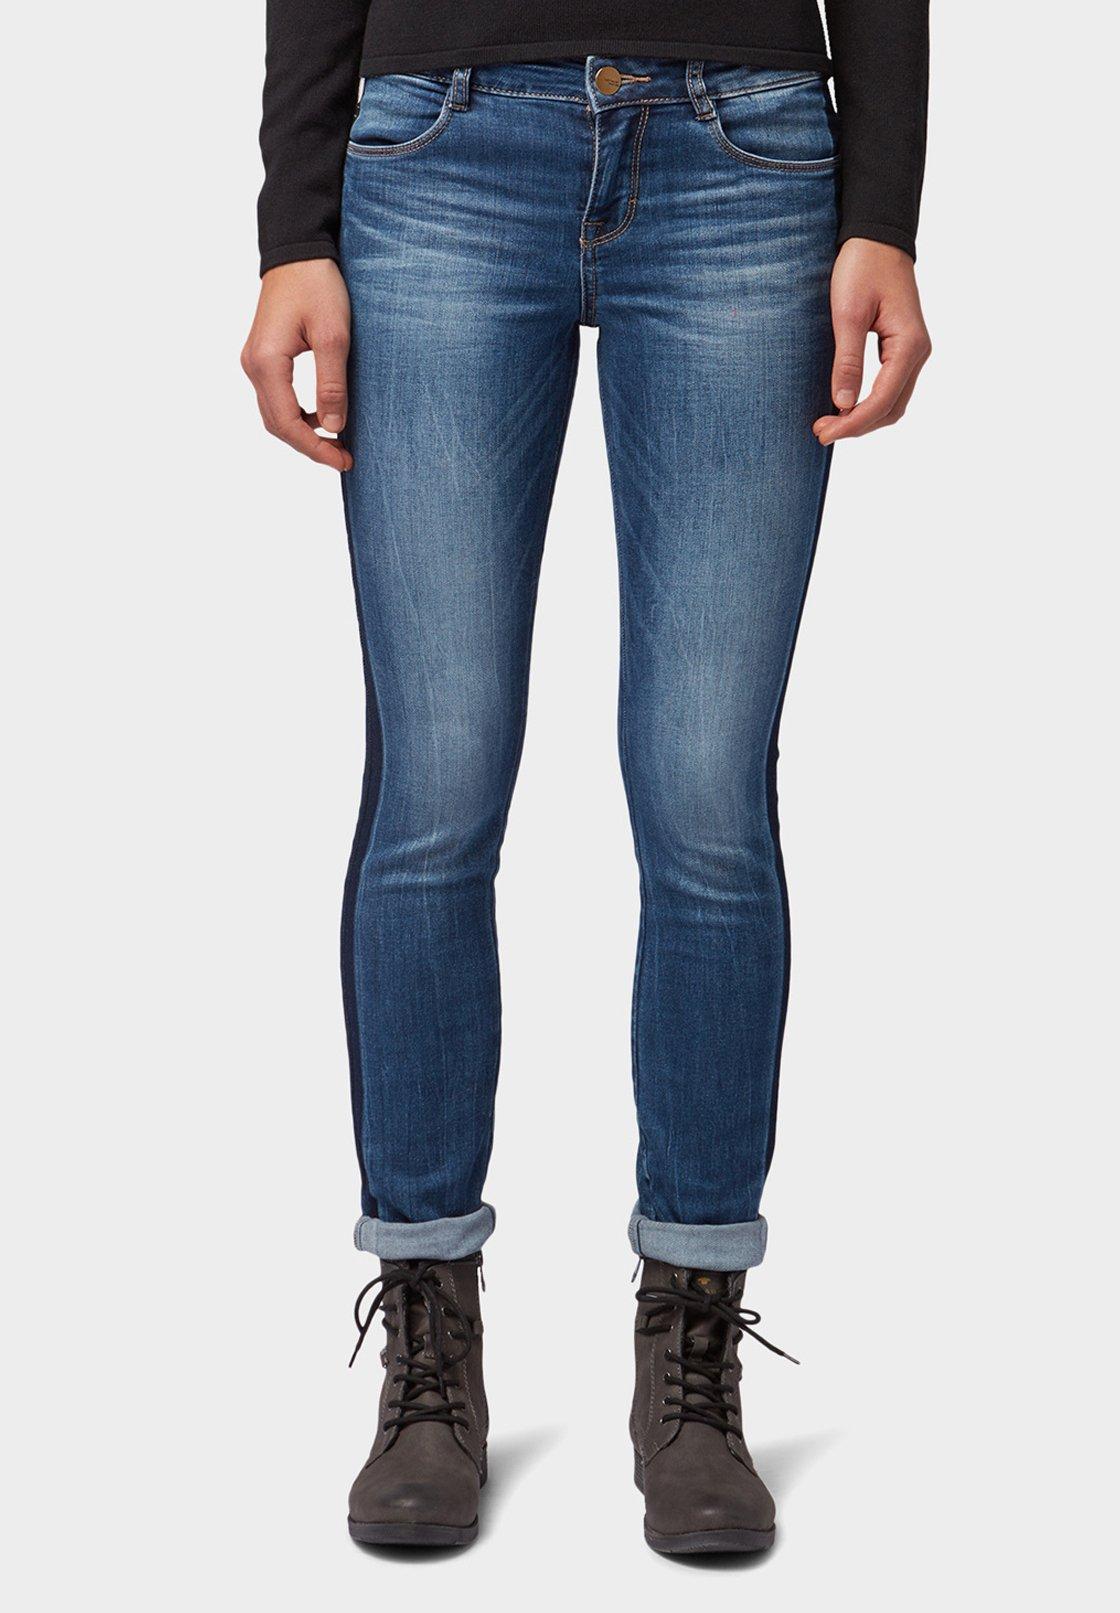 Tom Tailor Slim Fit Jeans Blue Denim 05IejrAe